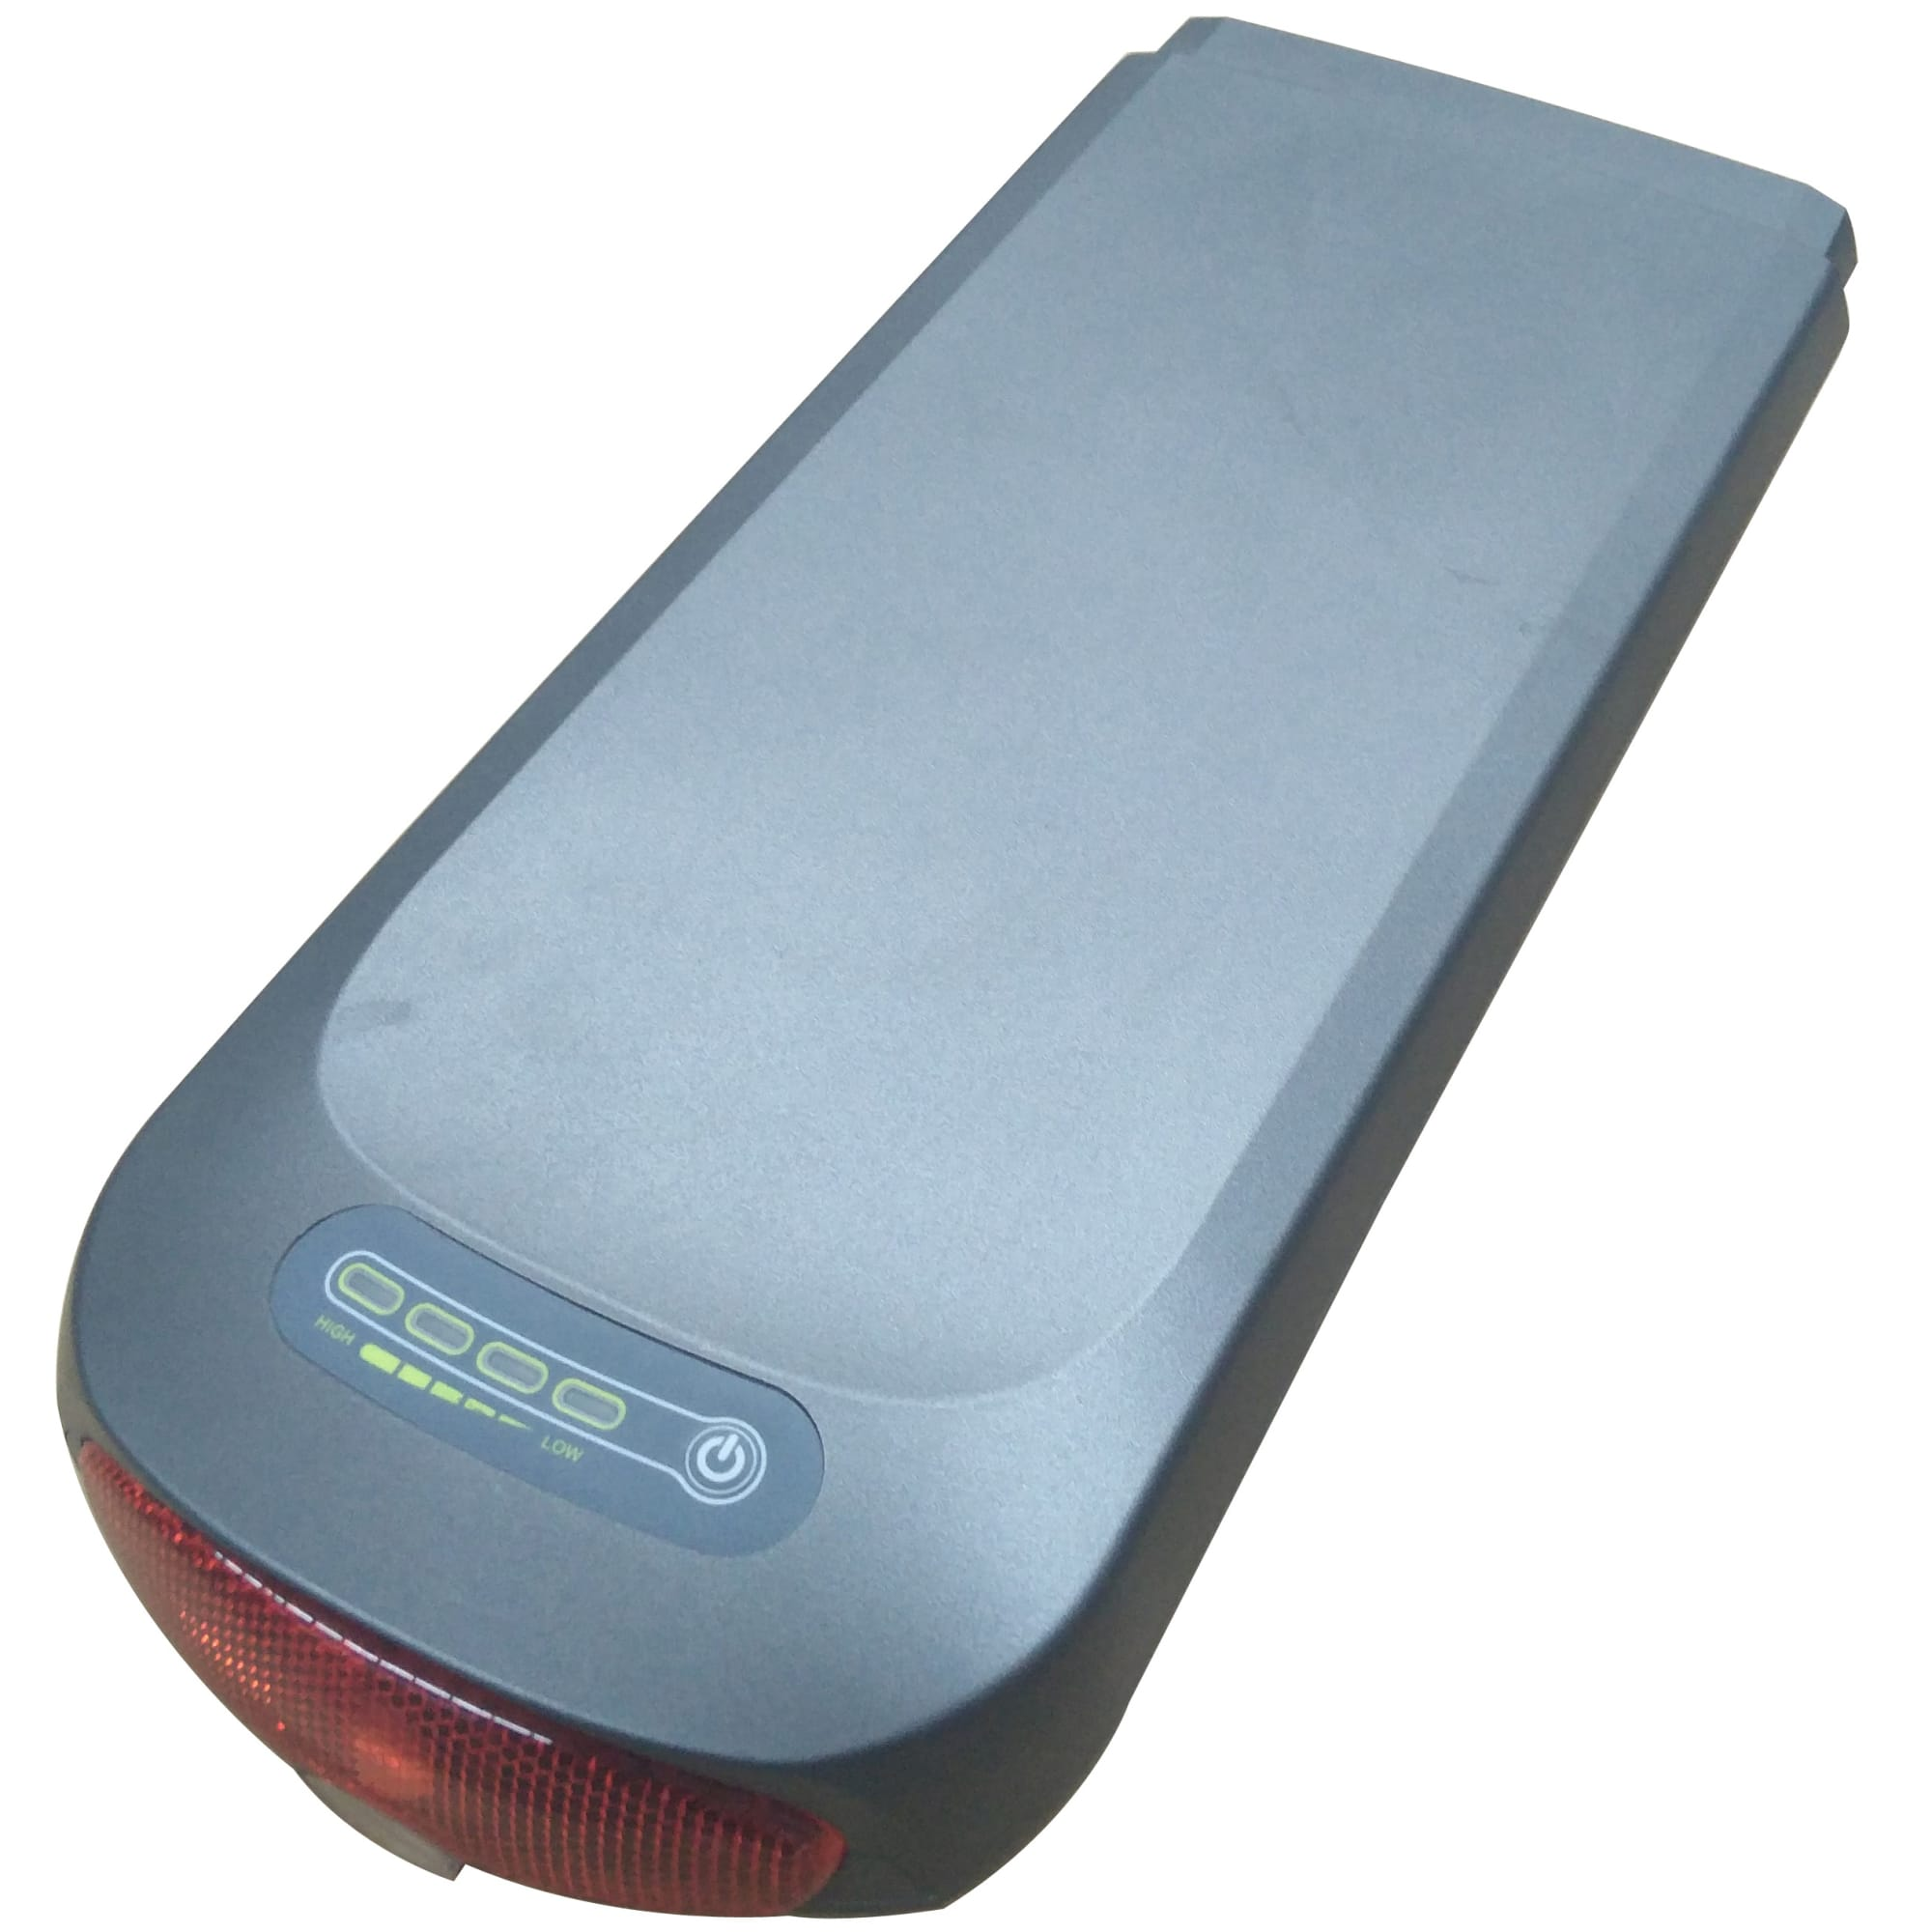 Passer til Icemint passion med 36 volt